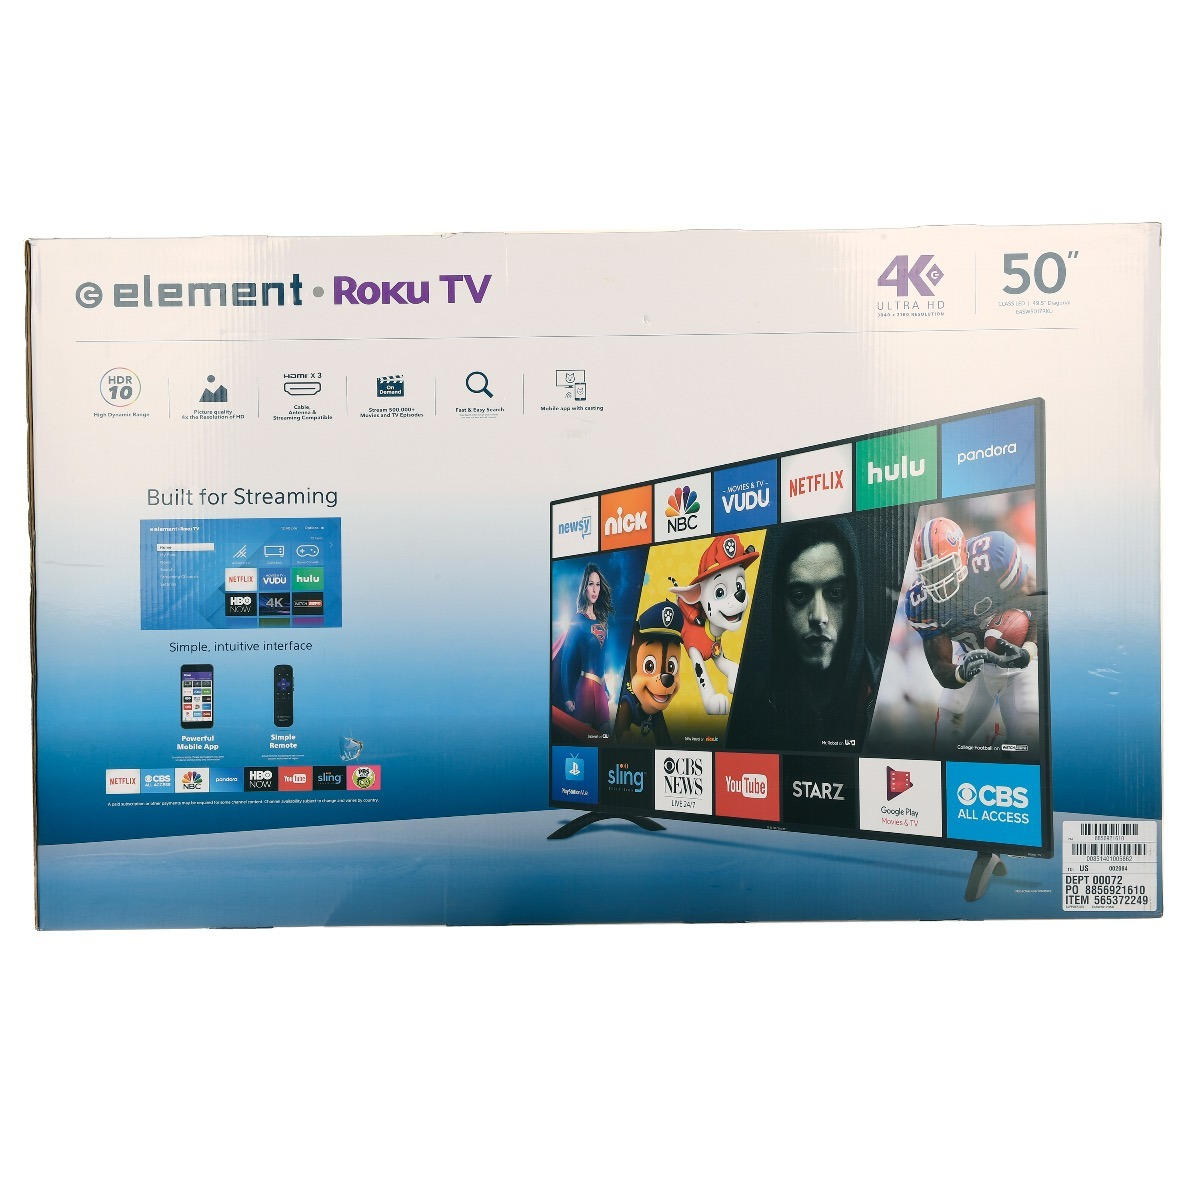 798ef748f23b9 pantalla smart tv 4k roku tv element 50 pulgadas e4sw5017rku. Cargando zoom.